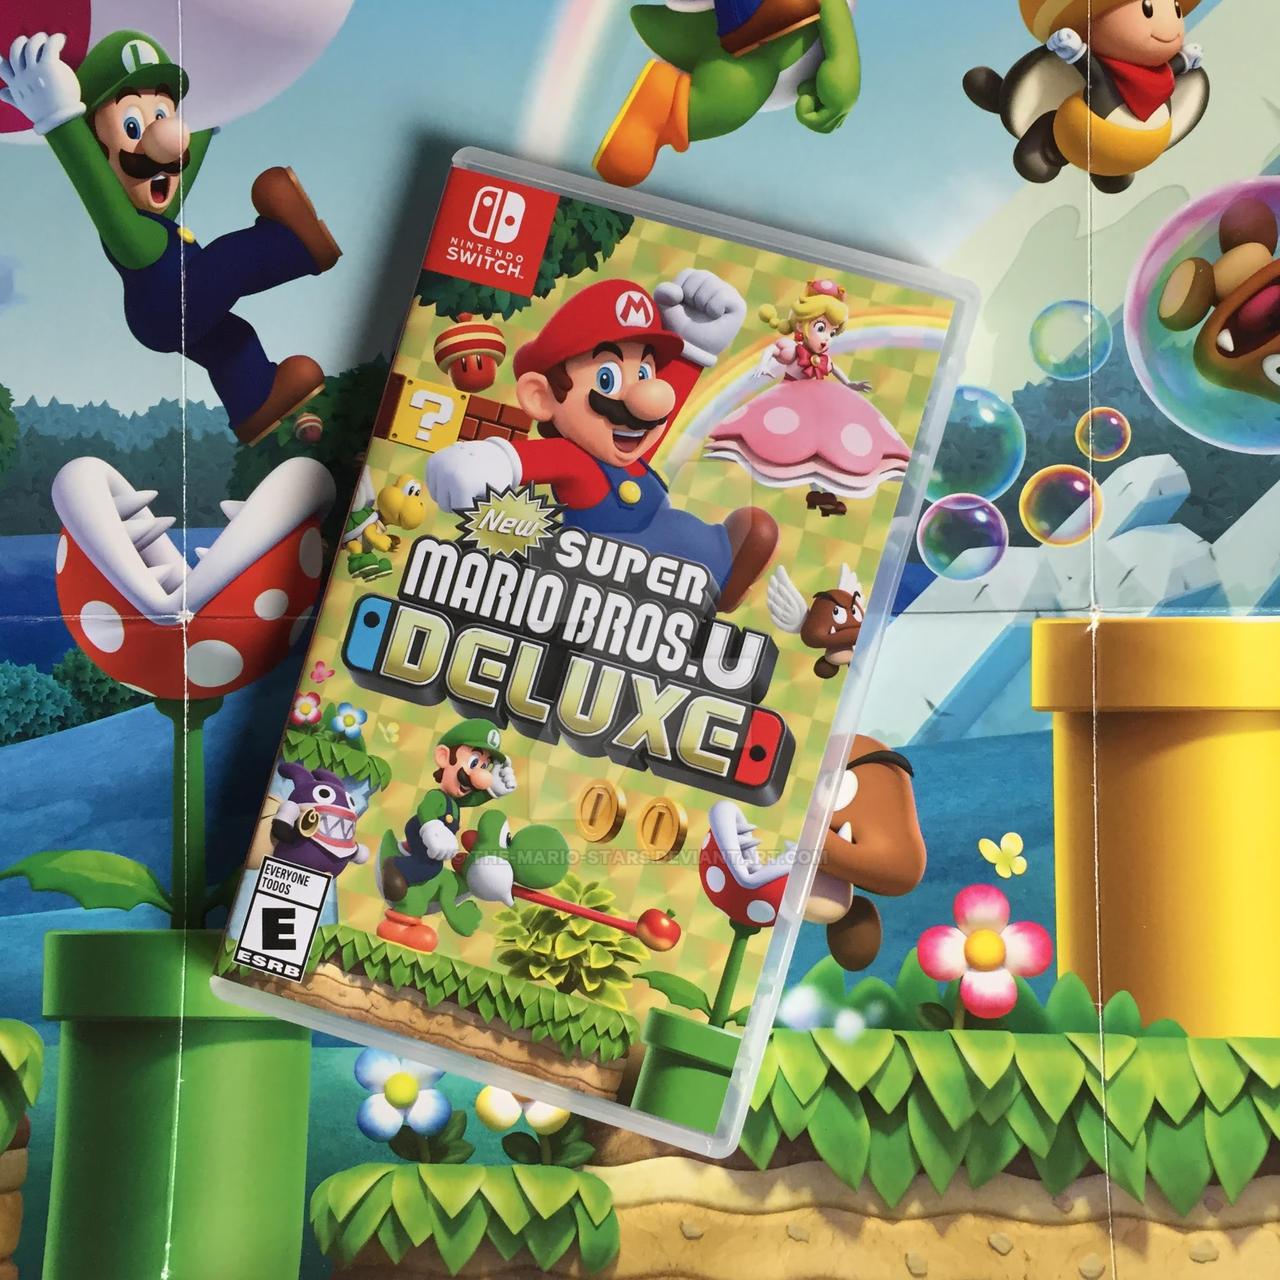 New Super Mario Bros U Deluxe Nintendo Switch By The Mario Stars